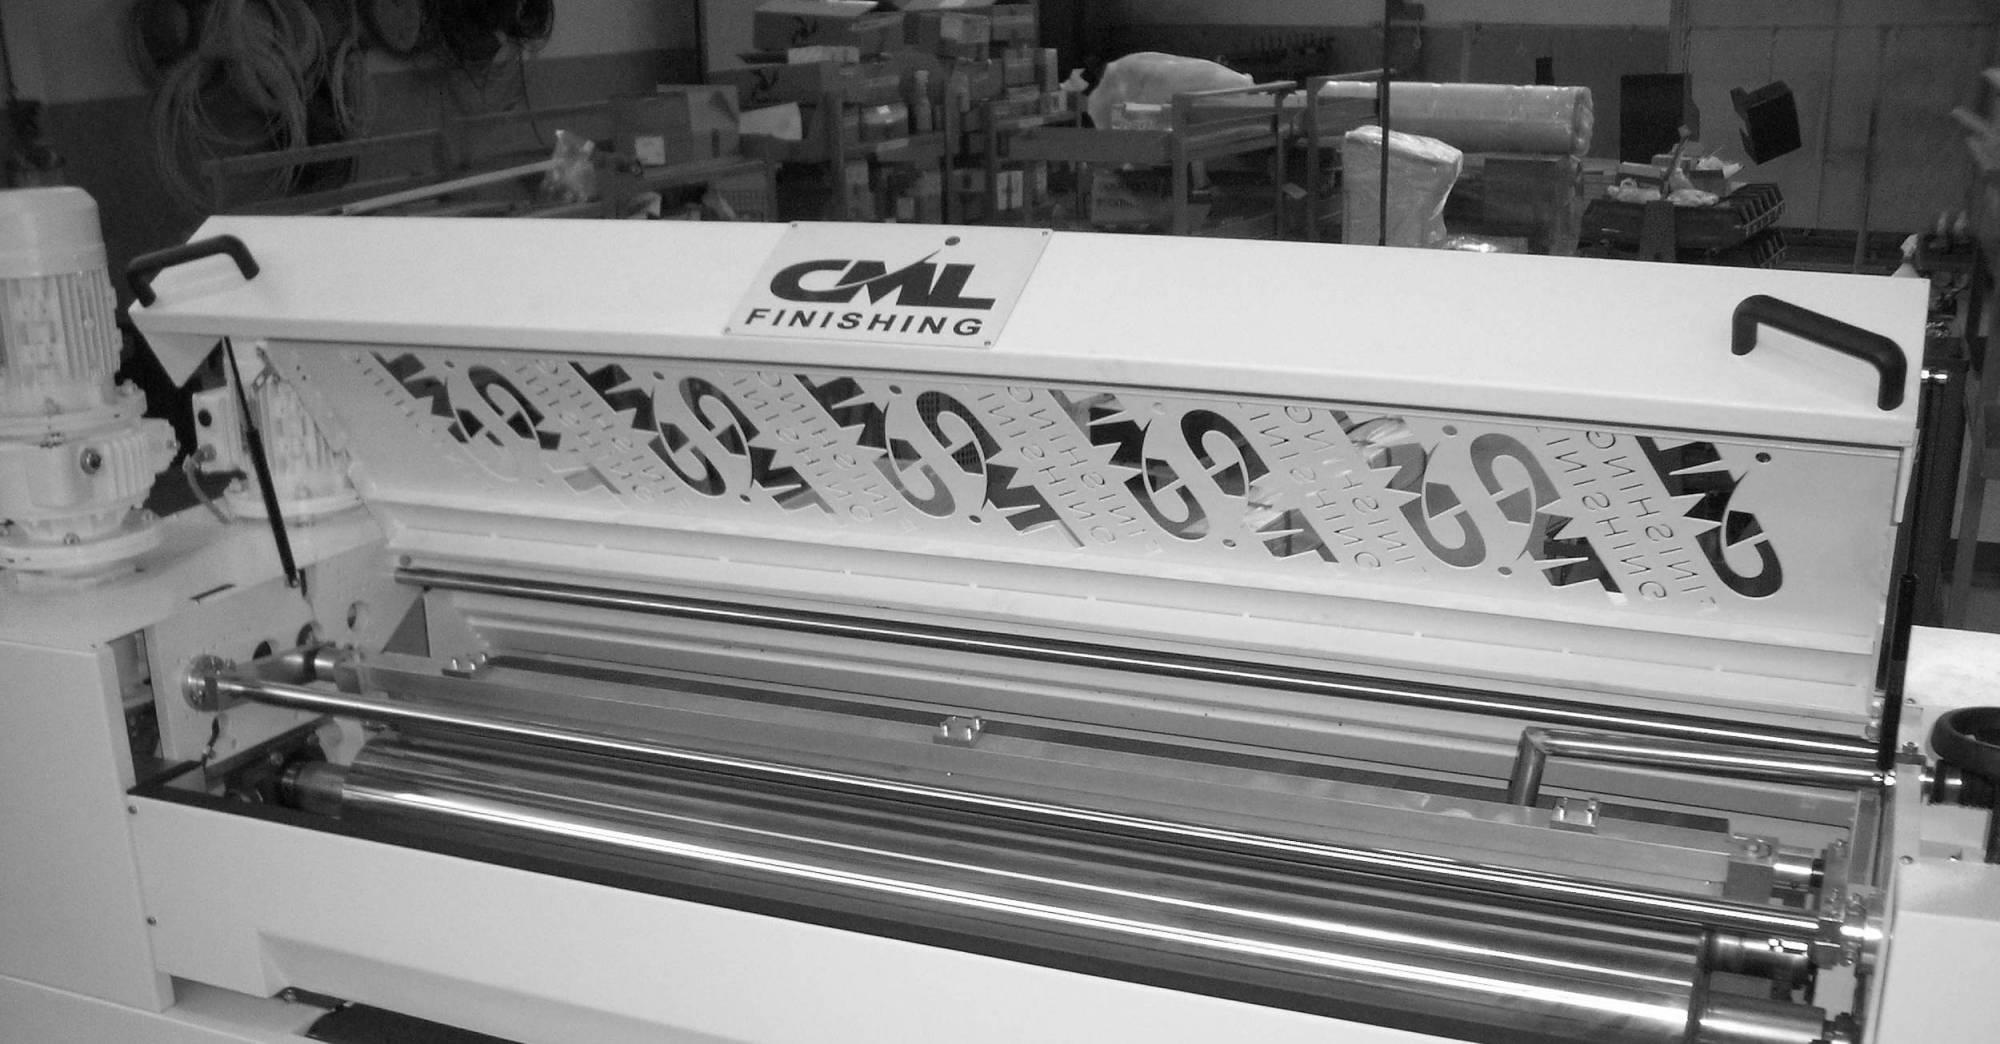 Macchine di verniciatura e tecniche di applicazione